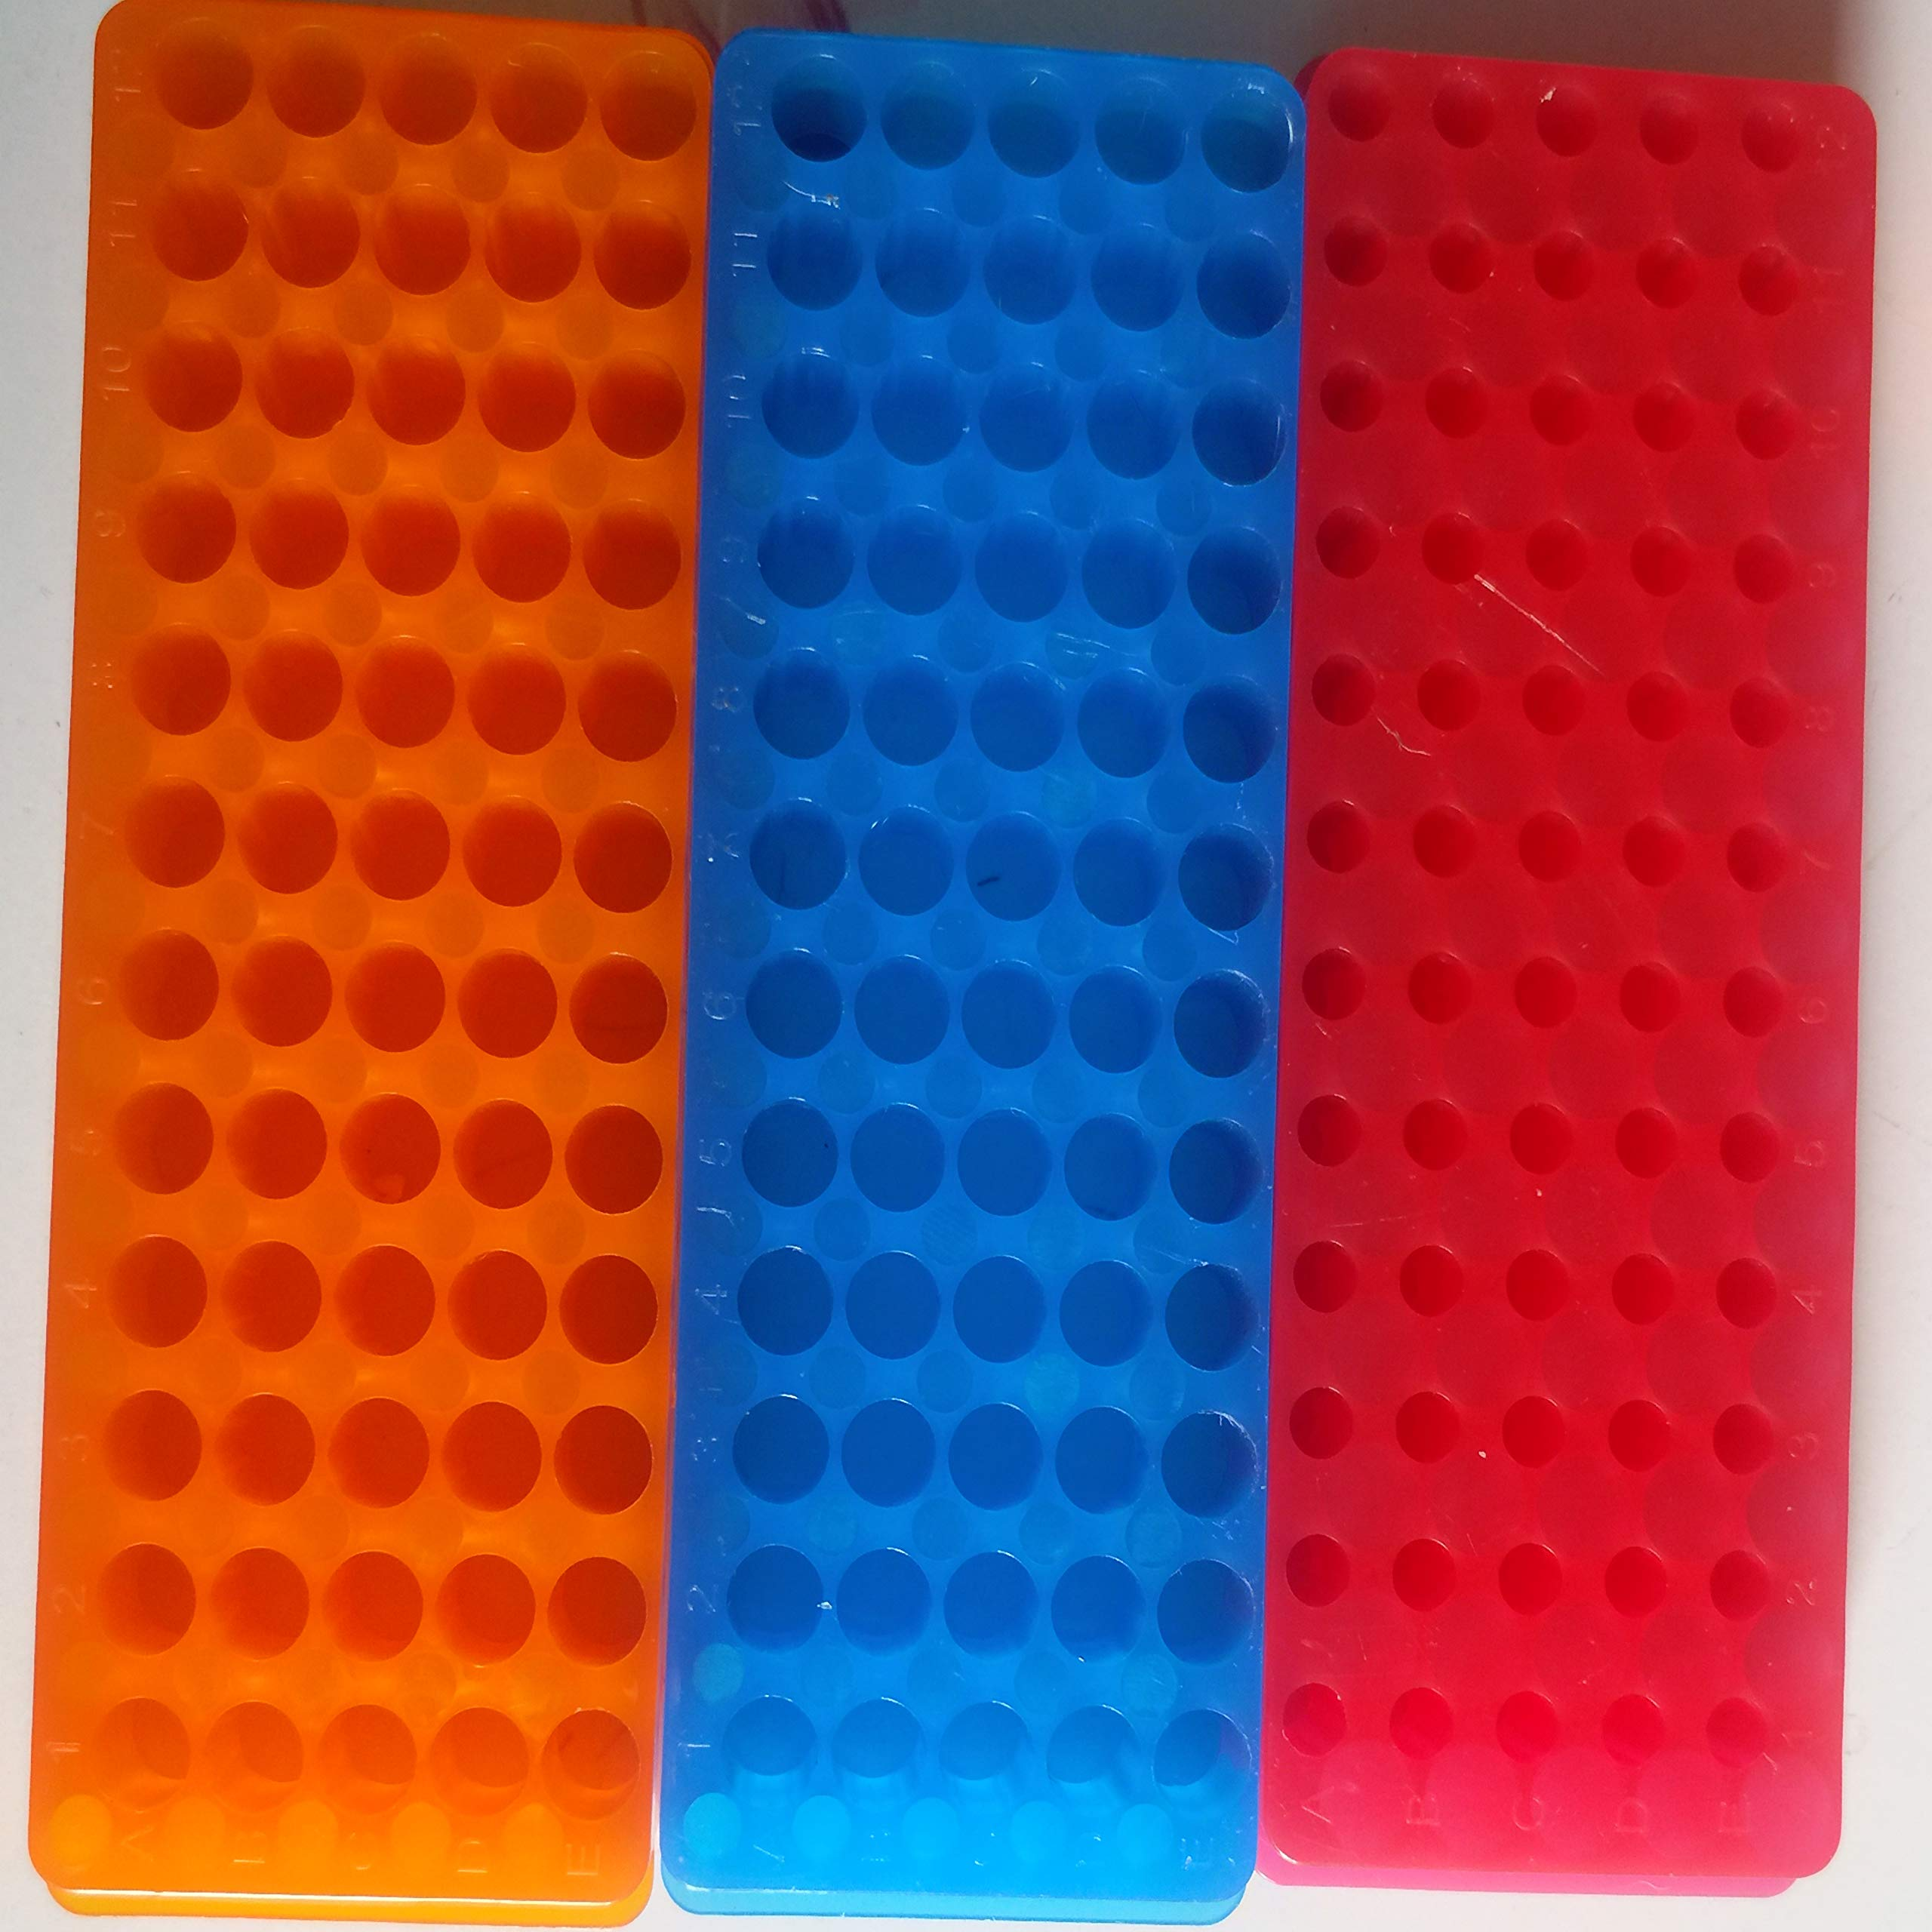 KINNOSE Tube Rack Double Panel 60-Well Polypropylene PCR Centrifuge Tube Holder for Microcentrifuge Tubes 0.2/0.5/1.5/1.8/2.0ml 3Pcs by KINNOSE